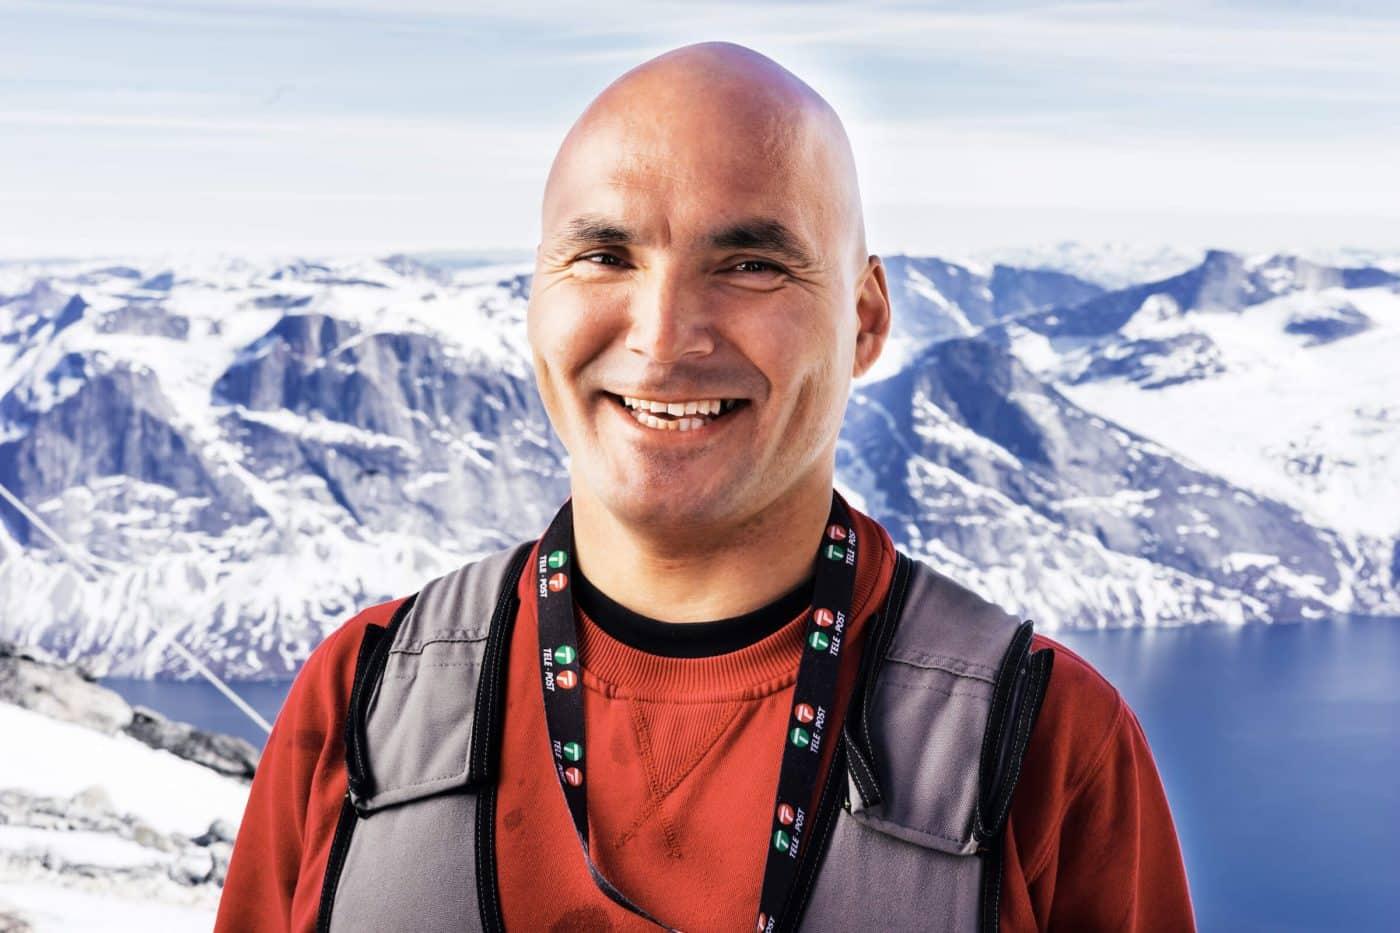 Portrait of Tele-Post's employee - Hartvig Heilmann, at the top of Qingaaq mountain. Photo by Filip Gielda